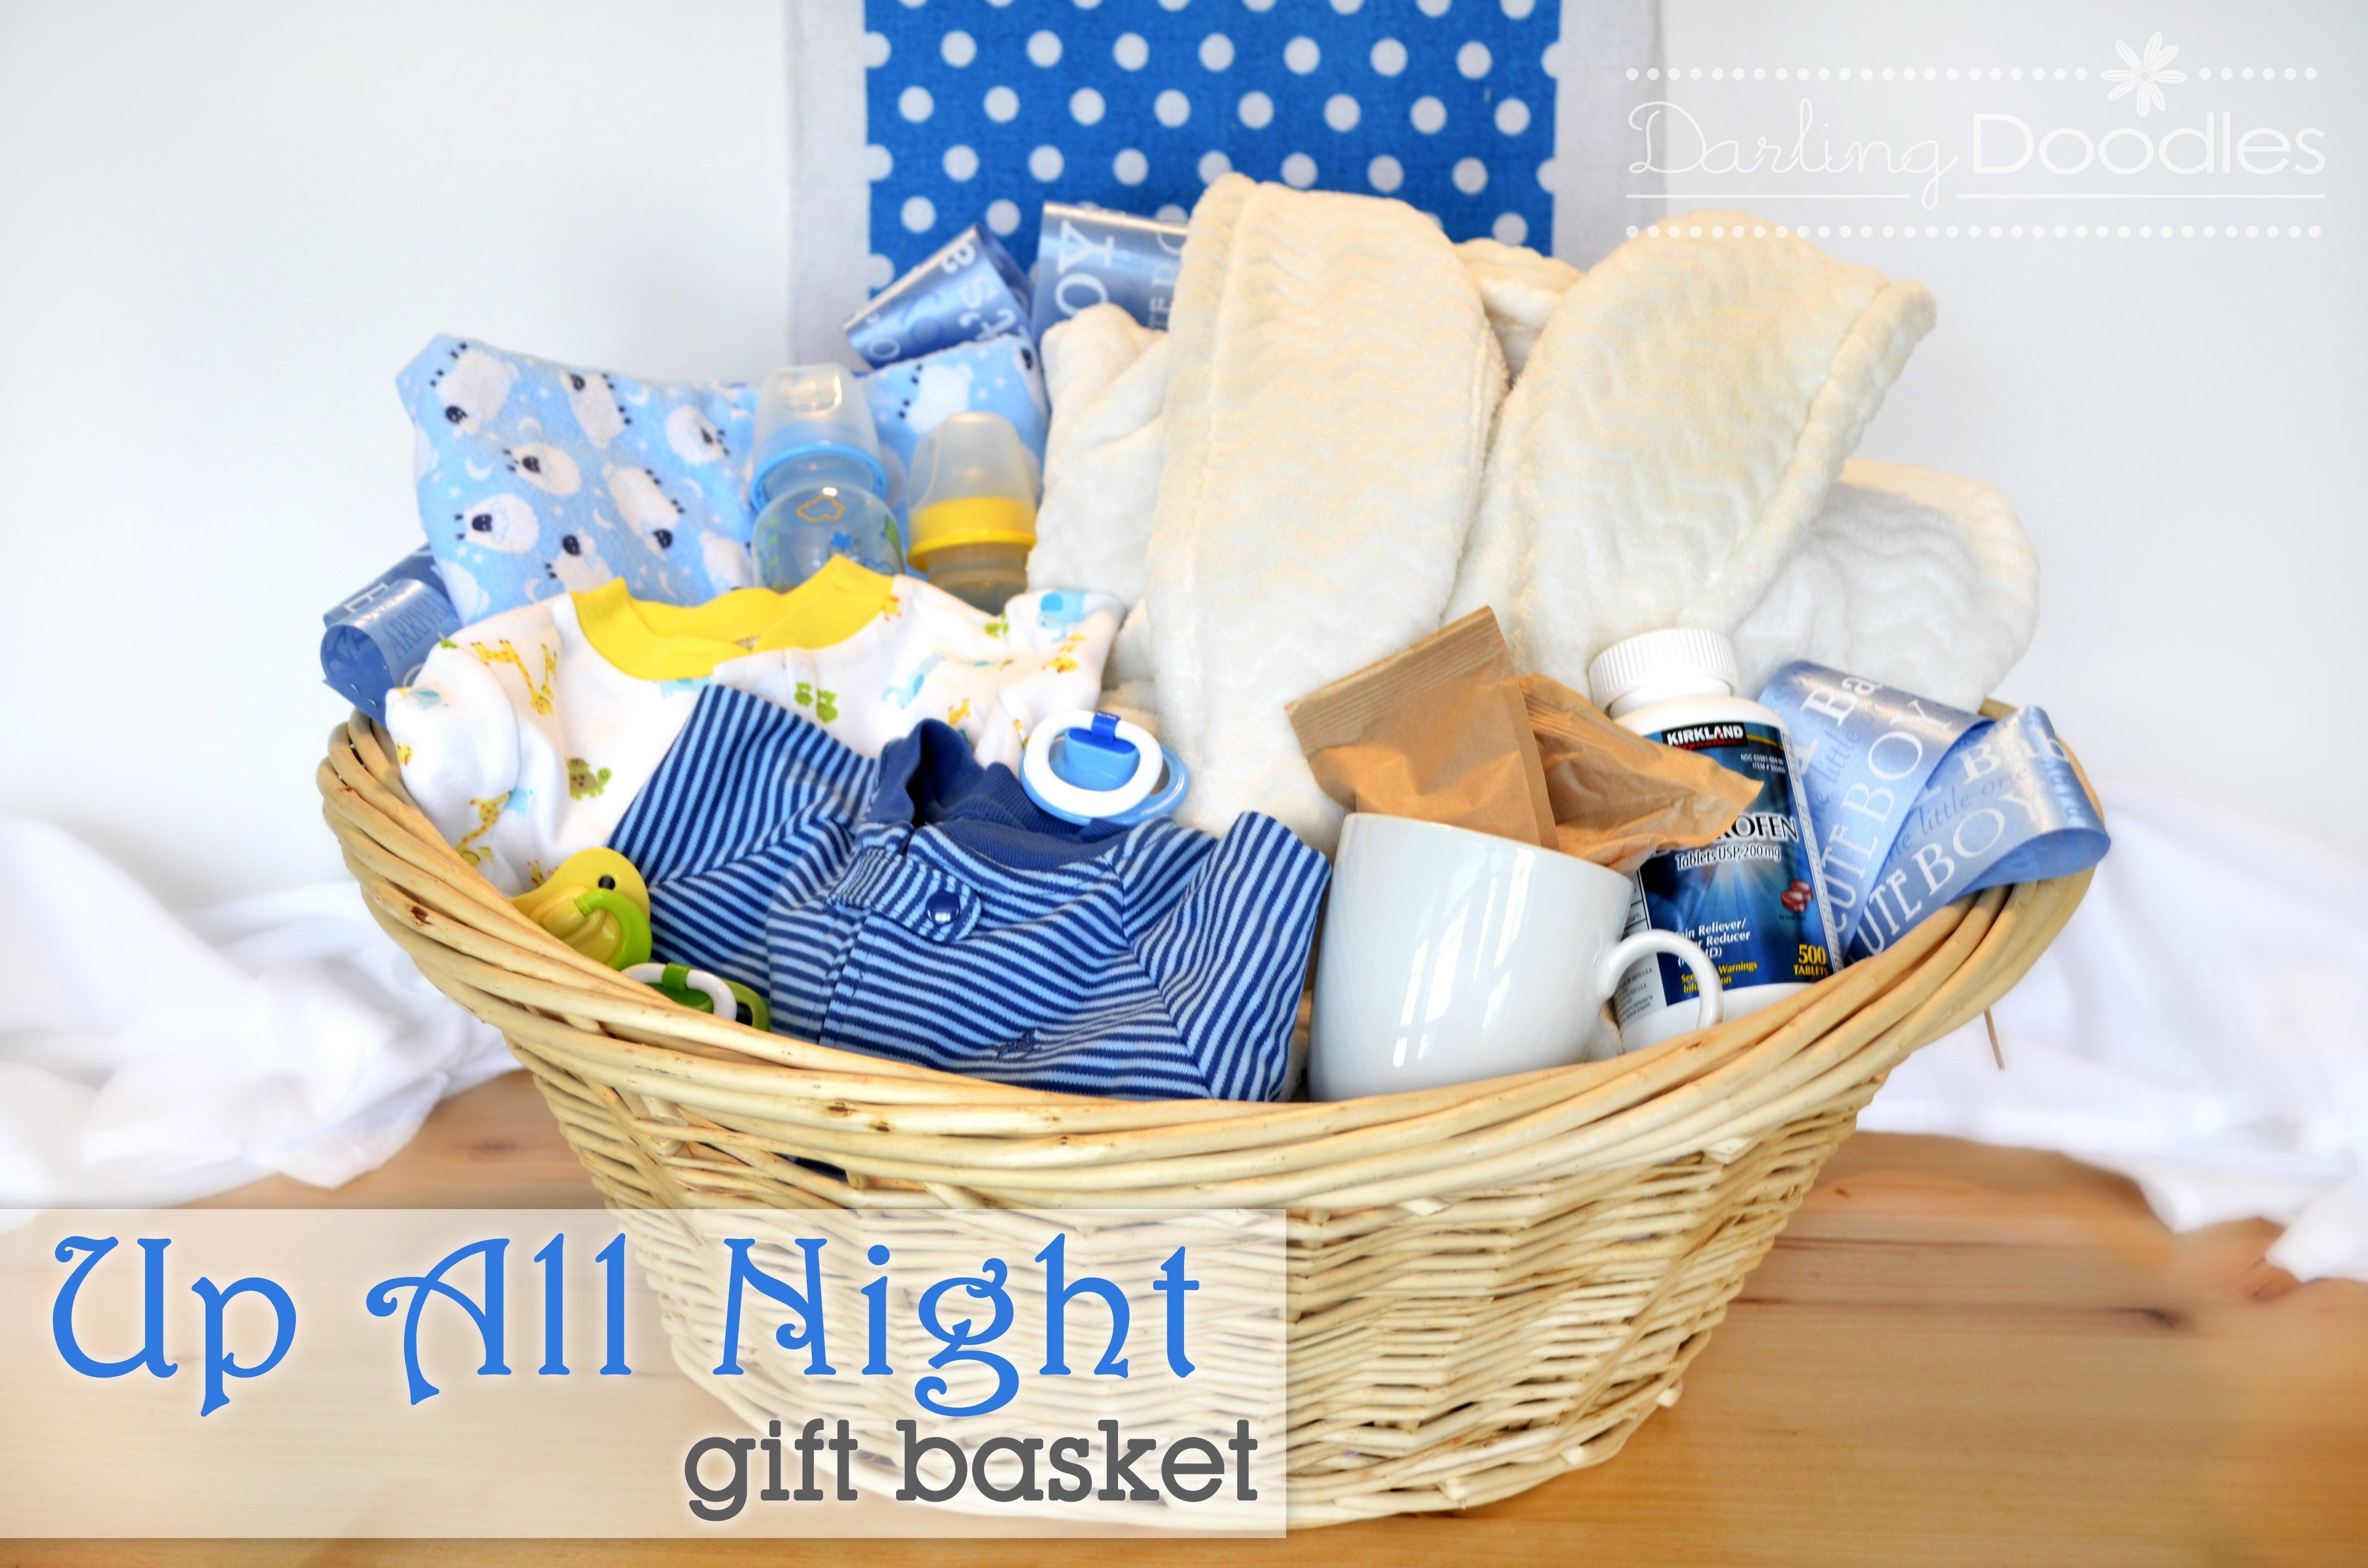 10 Stunning Baby Shower Gift Basket Ideas baby shower gift baskets for boy e280a2 baby showers ideas 2